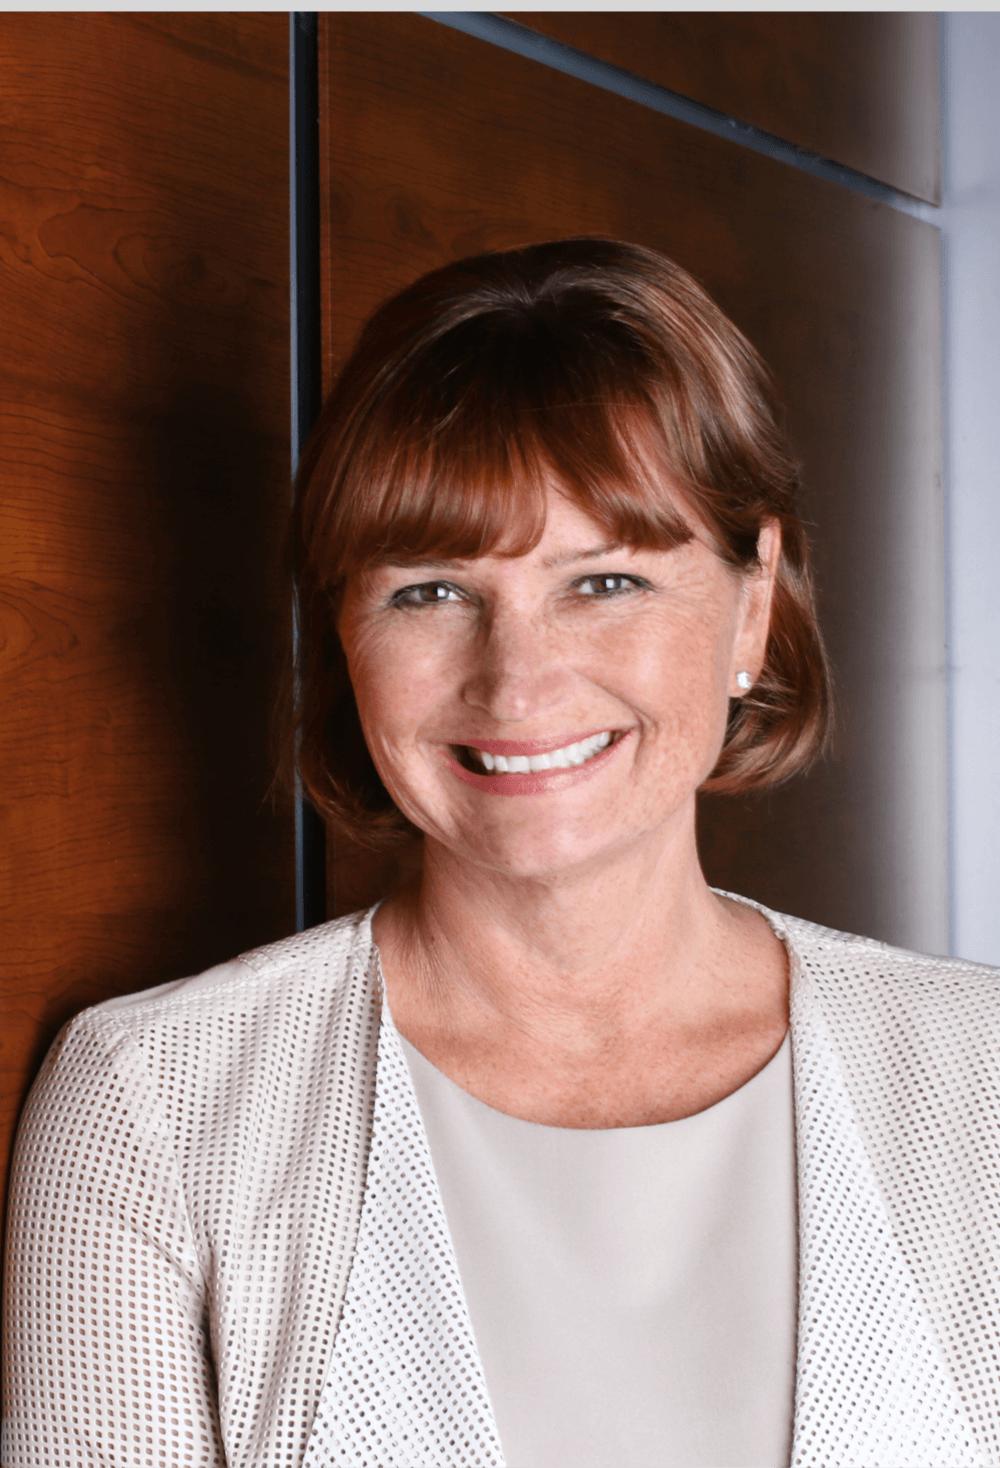 Marsha Walden, CEO of Destination BC